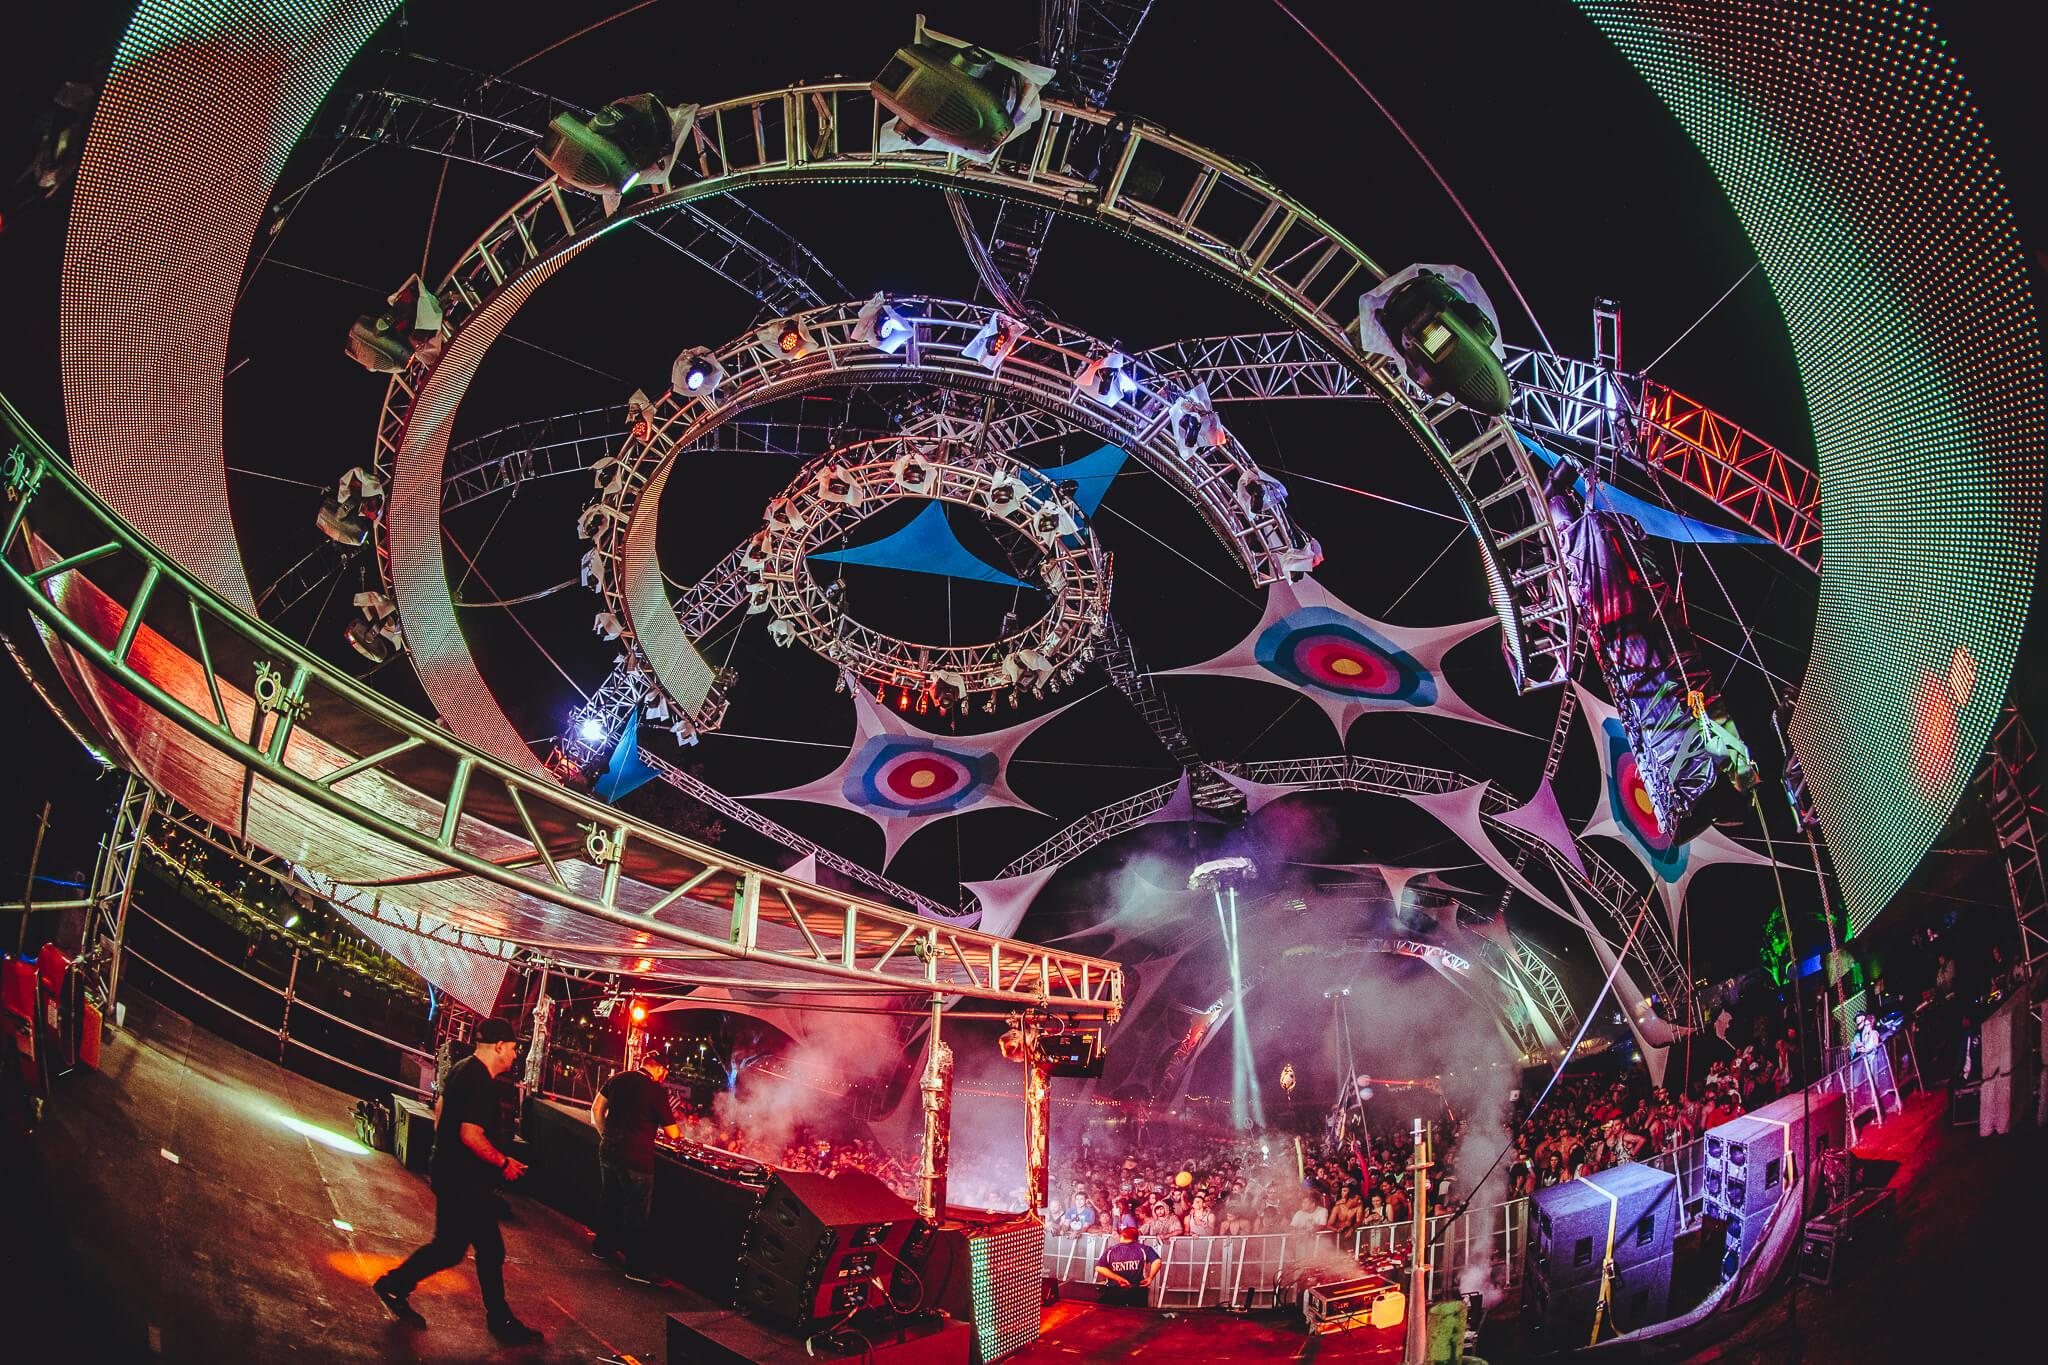 Horizon stage at Sunset Music Festival 2016